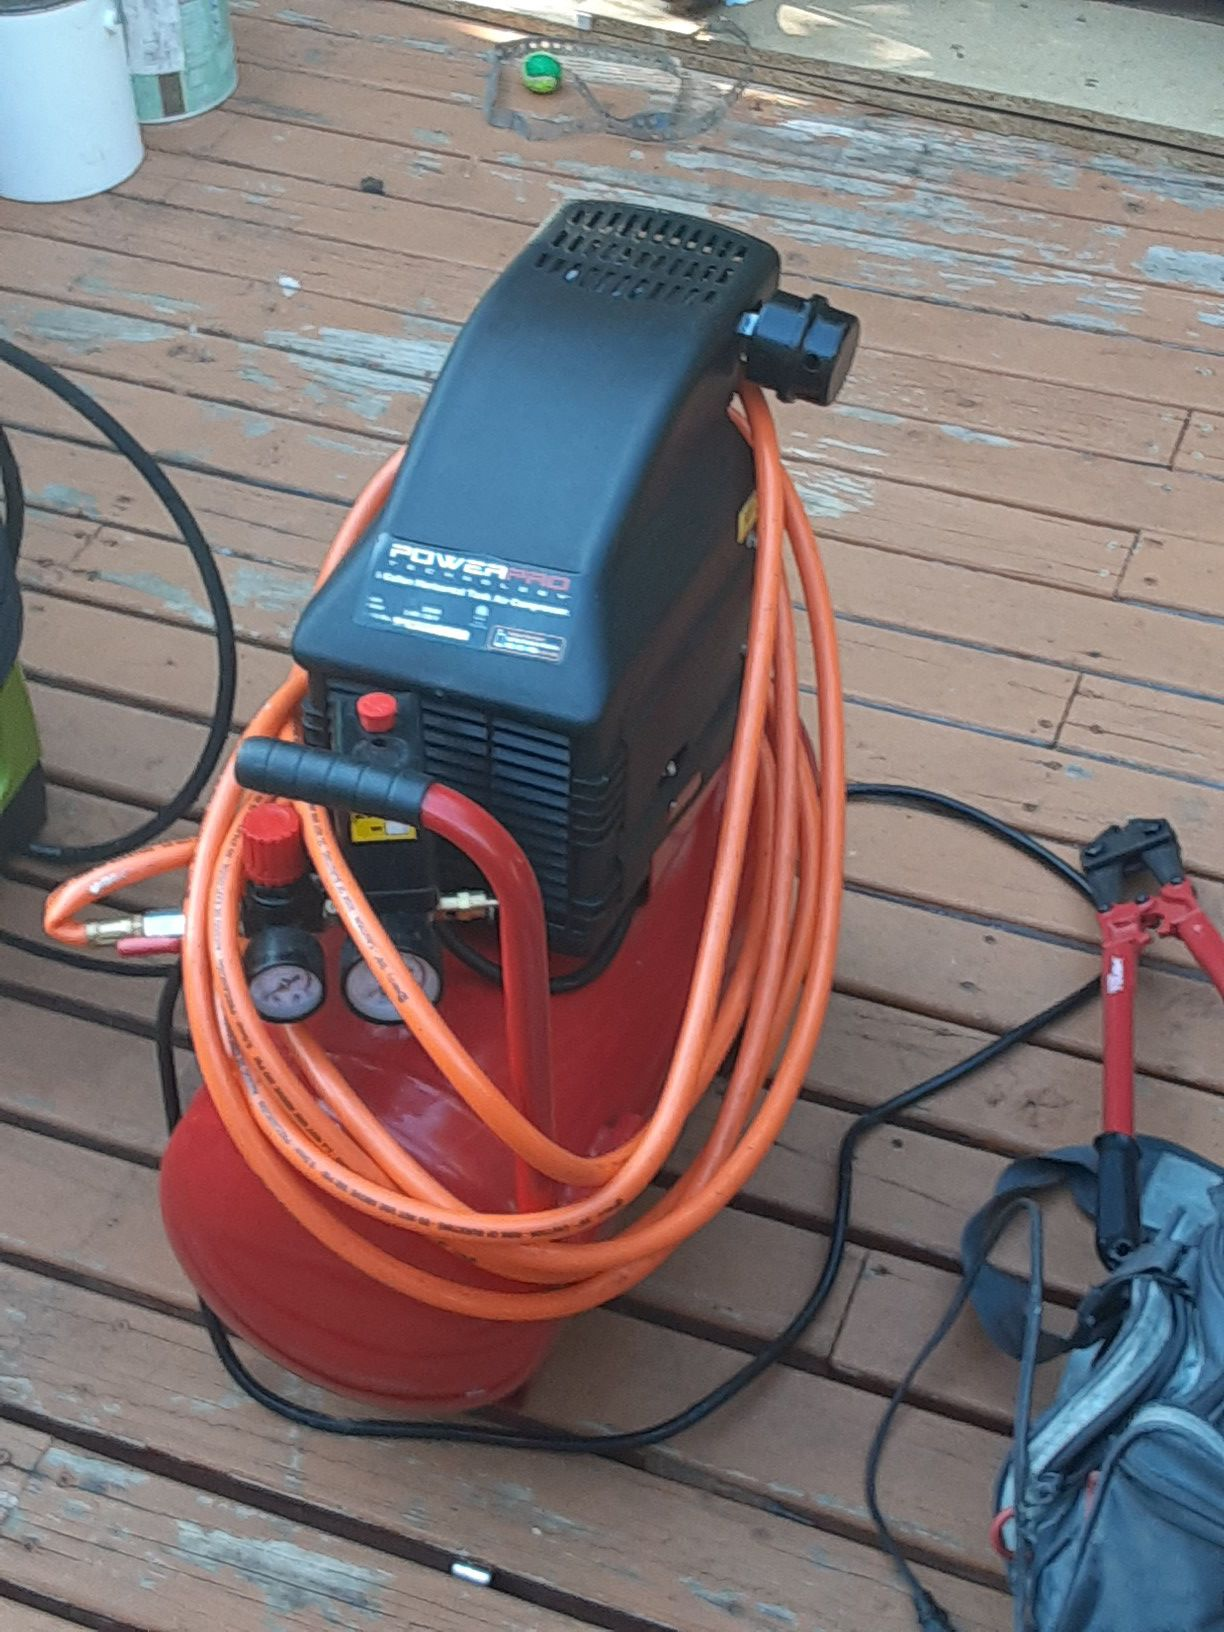 Powerpro air compressor